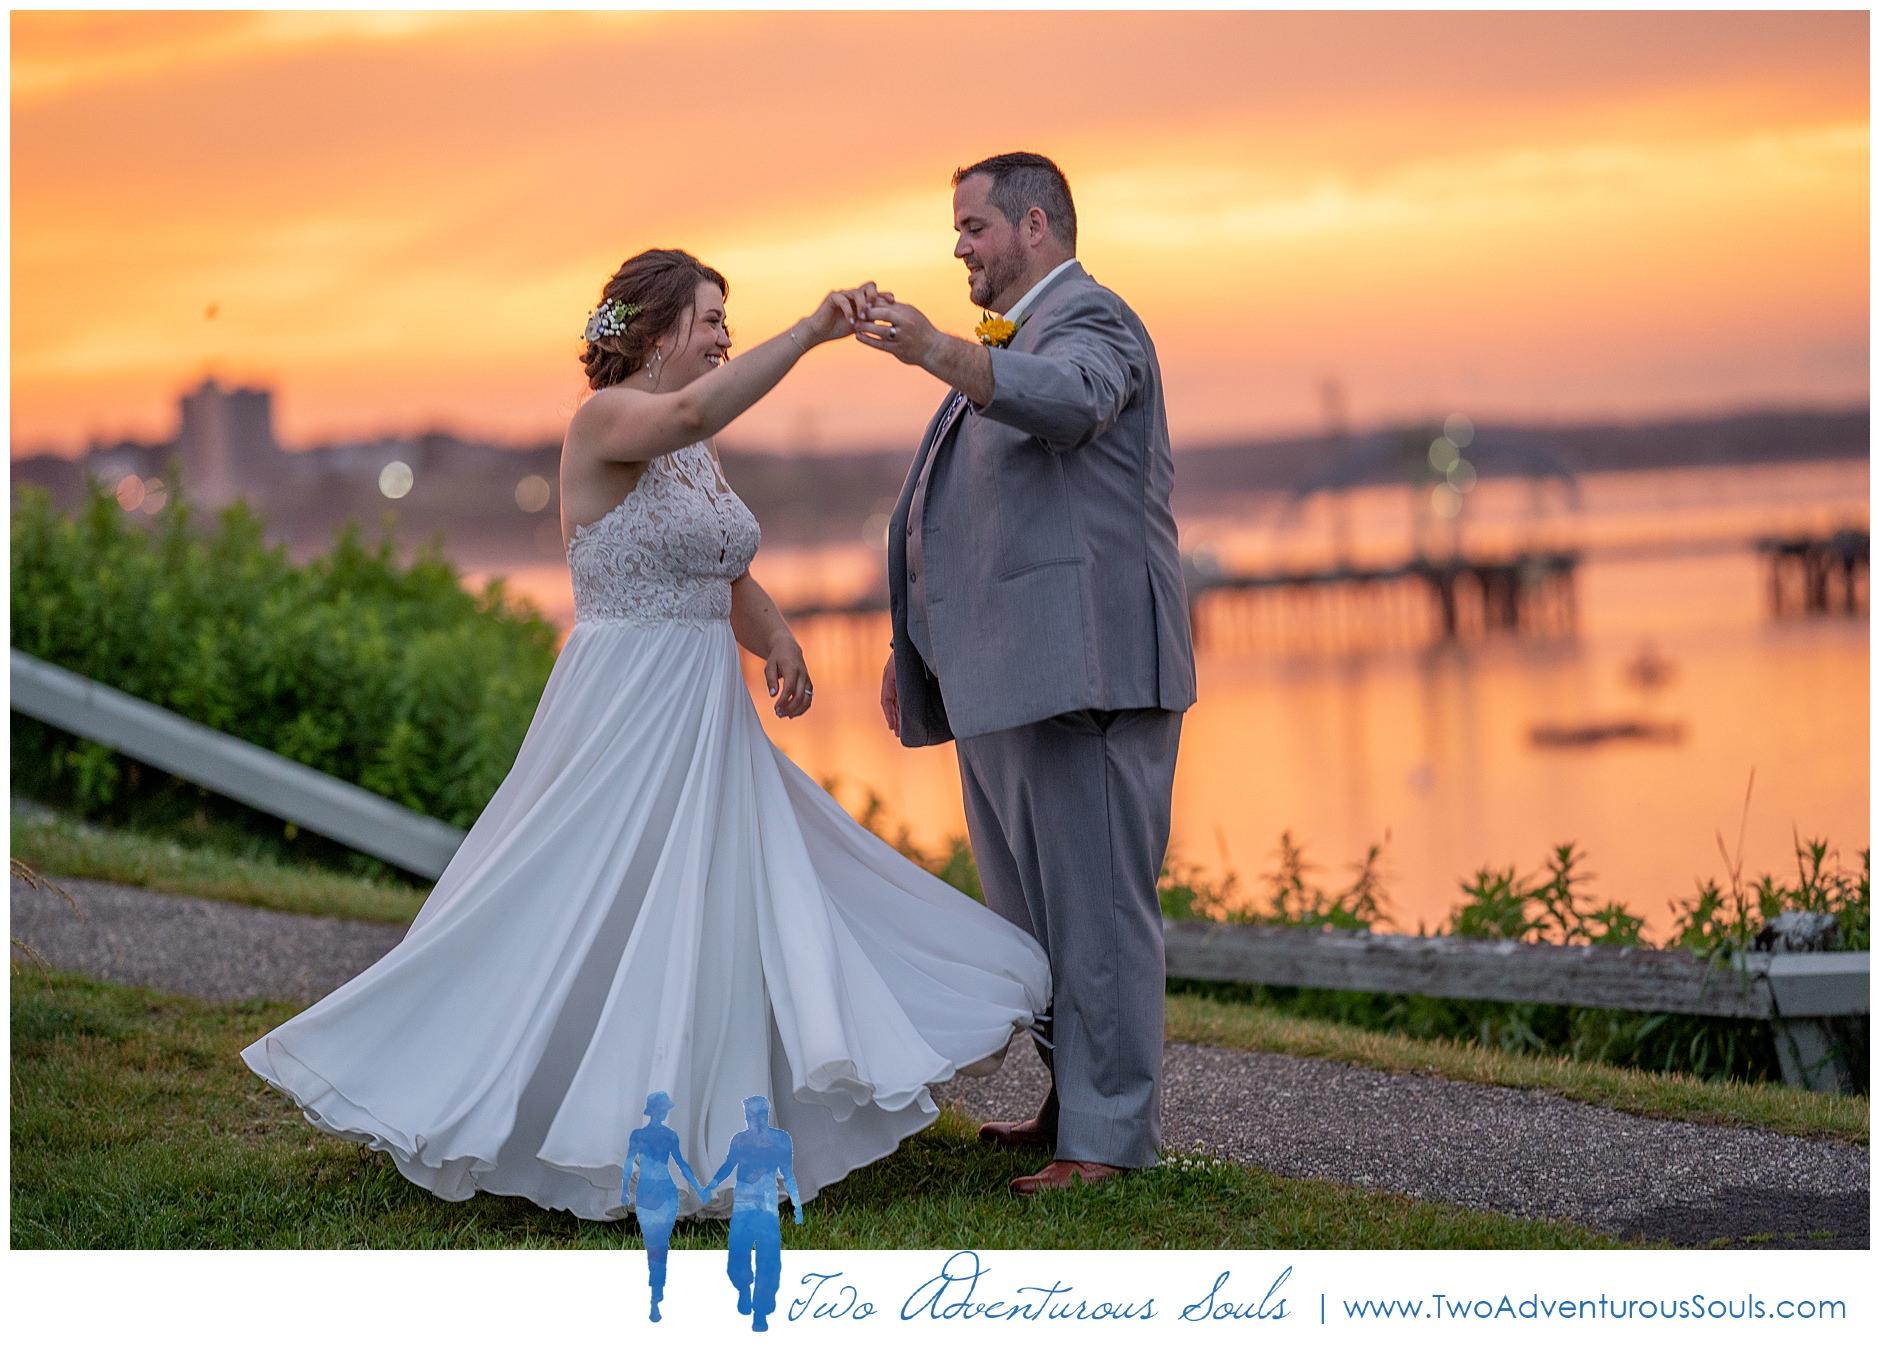 Maine Wedding Photographers, SMCC Wedding Photographers, Southern Maine Community College Wedding Photographers, Two Adventurous Souls-AshleyAaron_0043.jpg